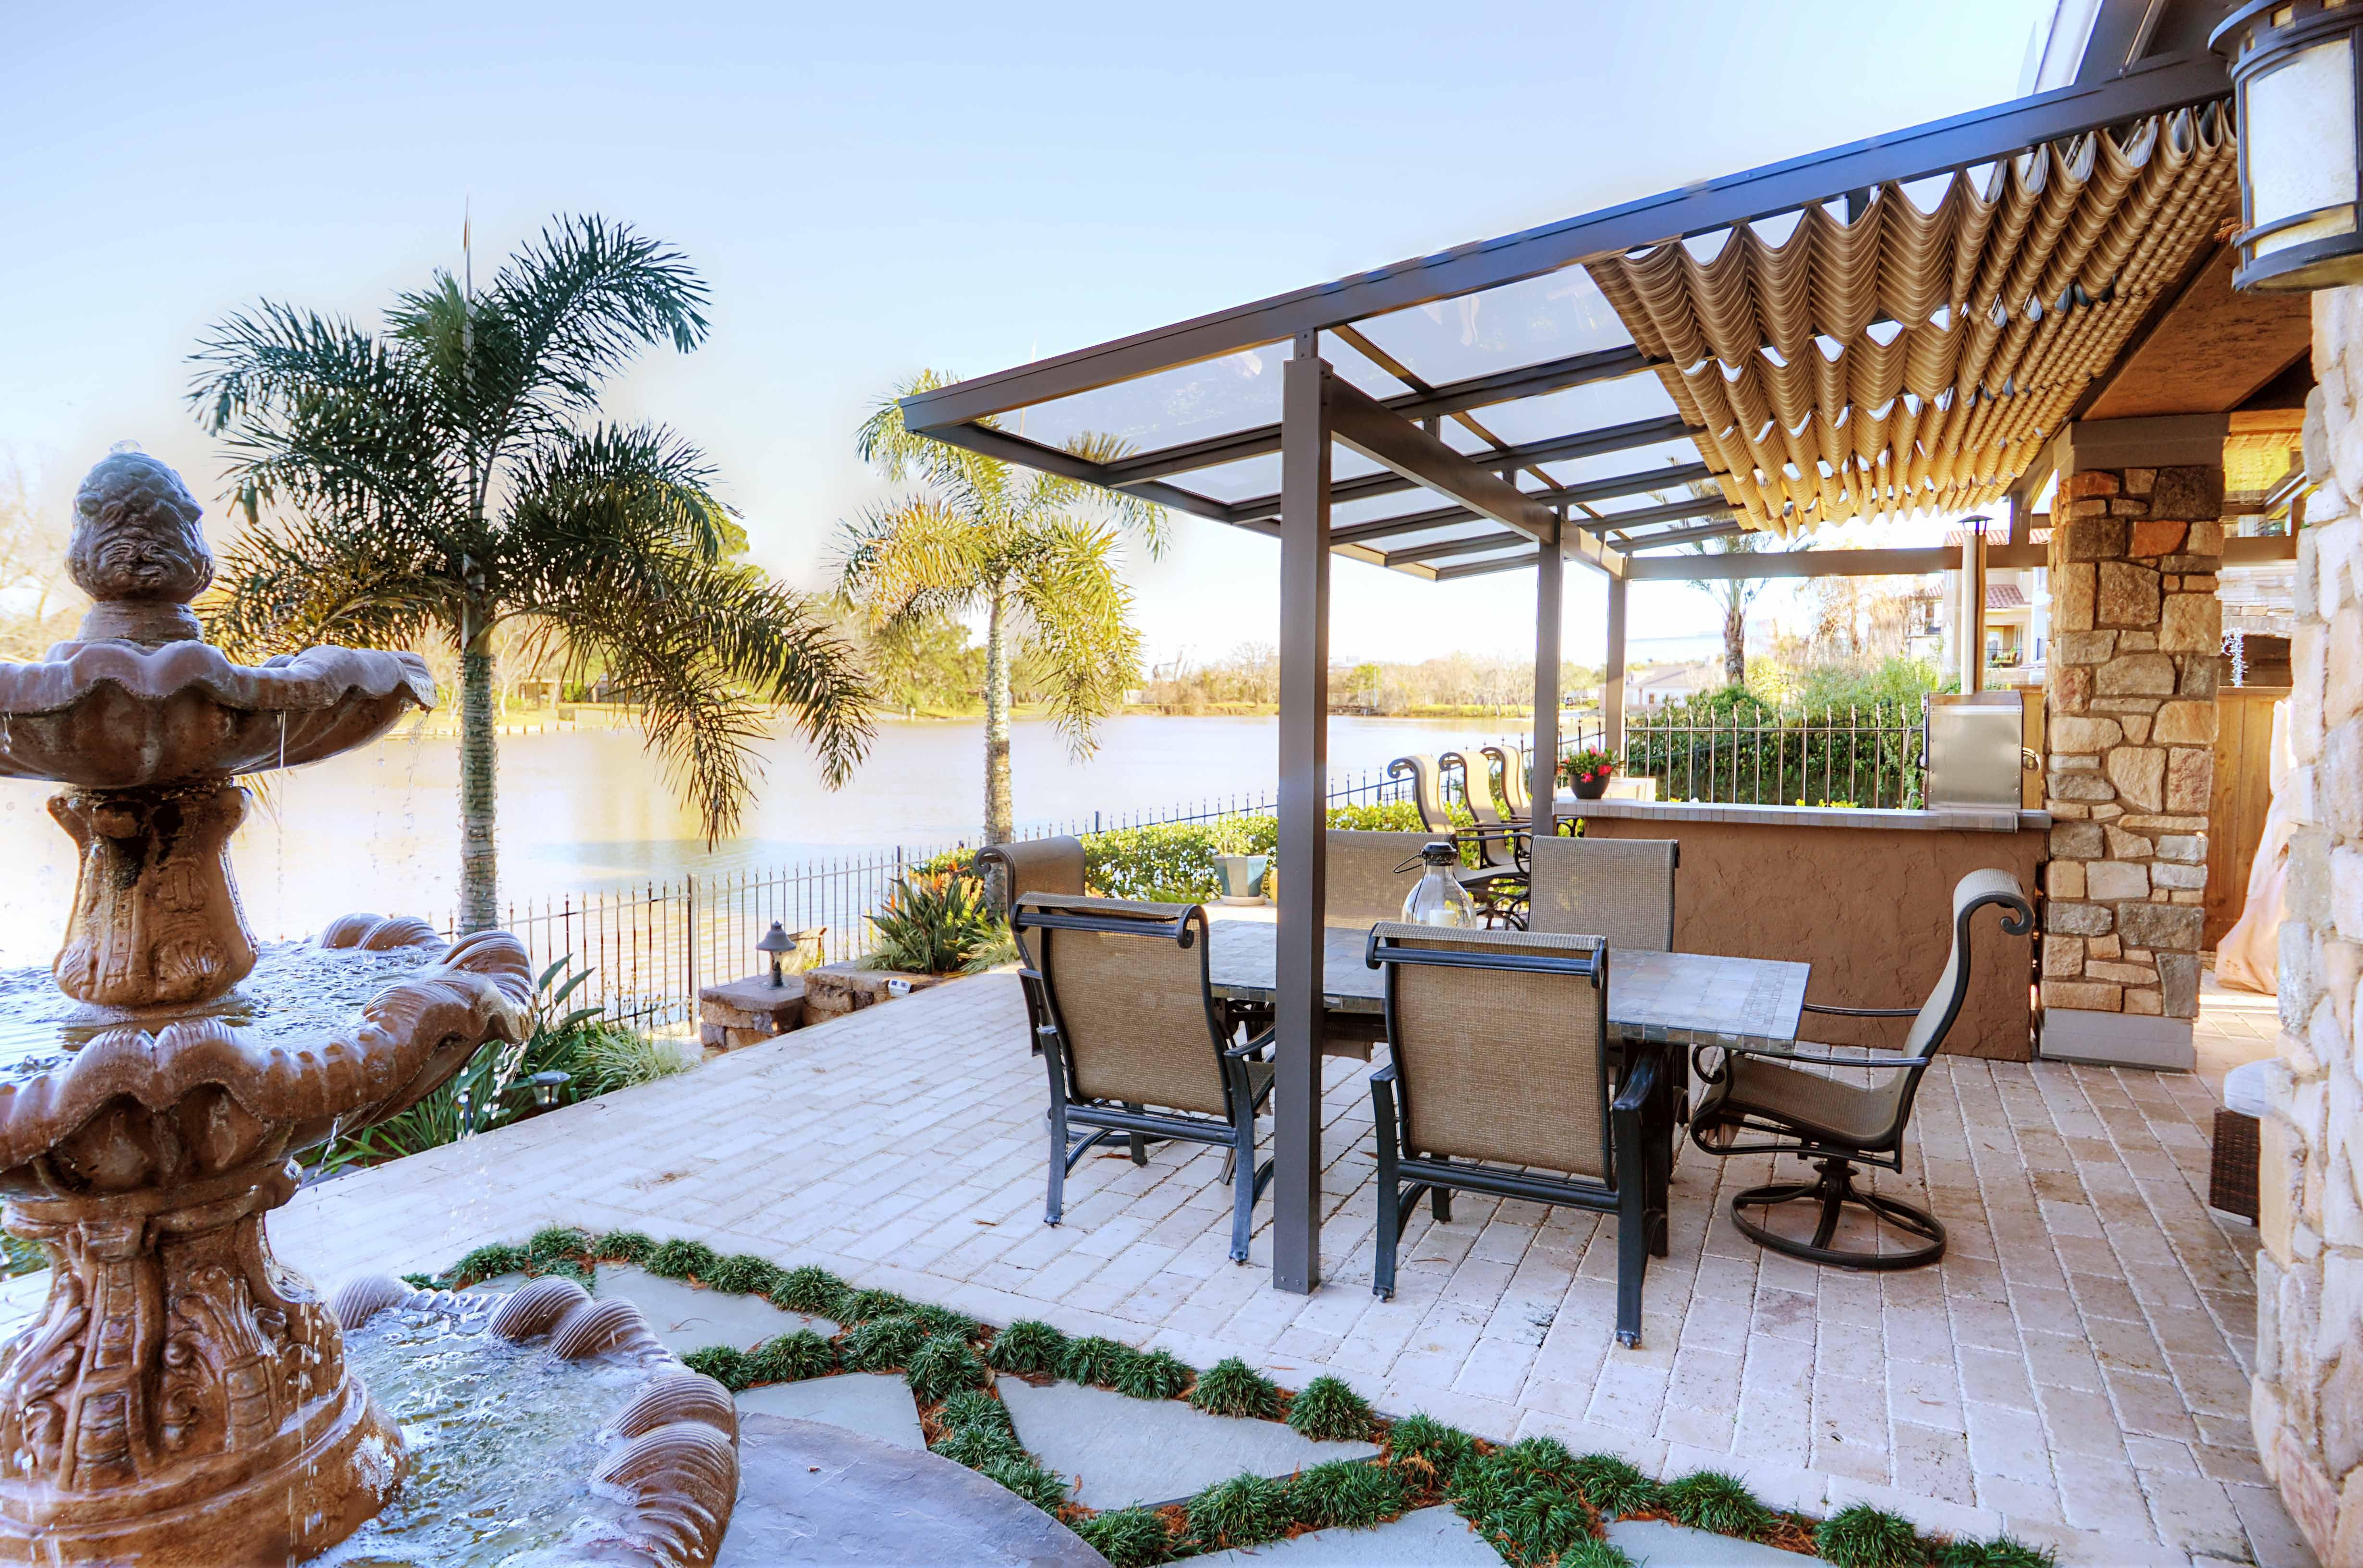 Courtyard Ideas, Patio Ideas, Backyard Ideas, Outdoor Ideas, Outdoor  Spaces, Outdoor Living, Cozy Patio, Sun Shades, Houston